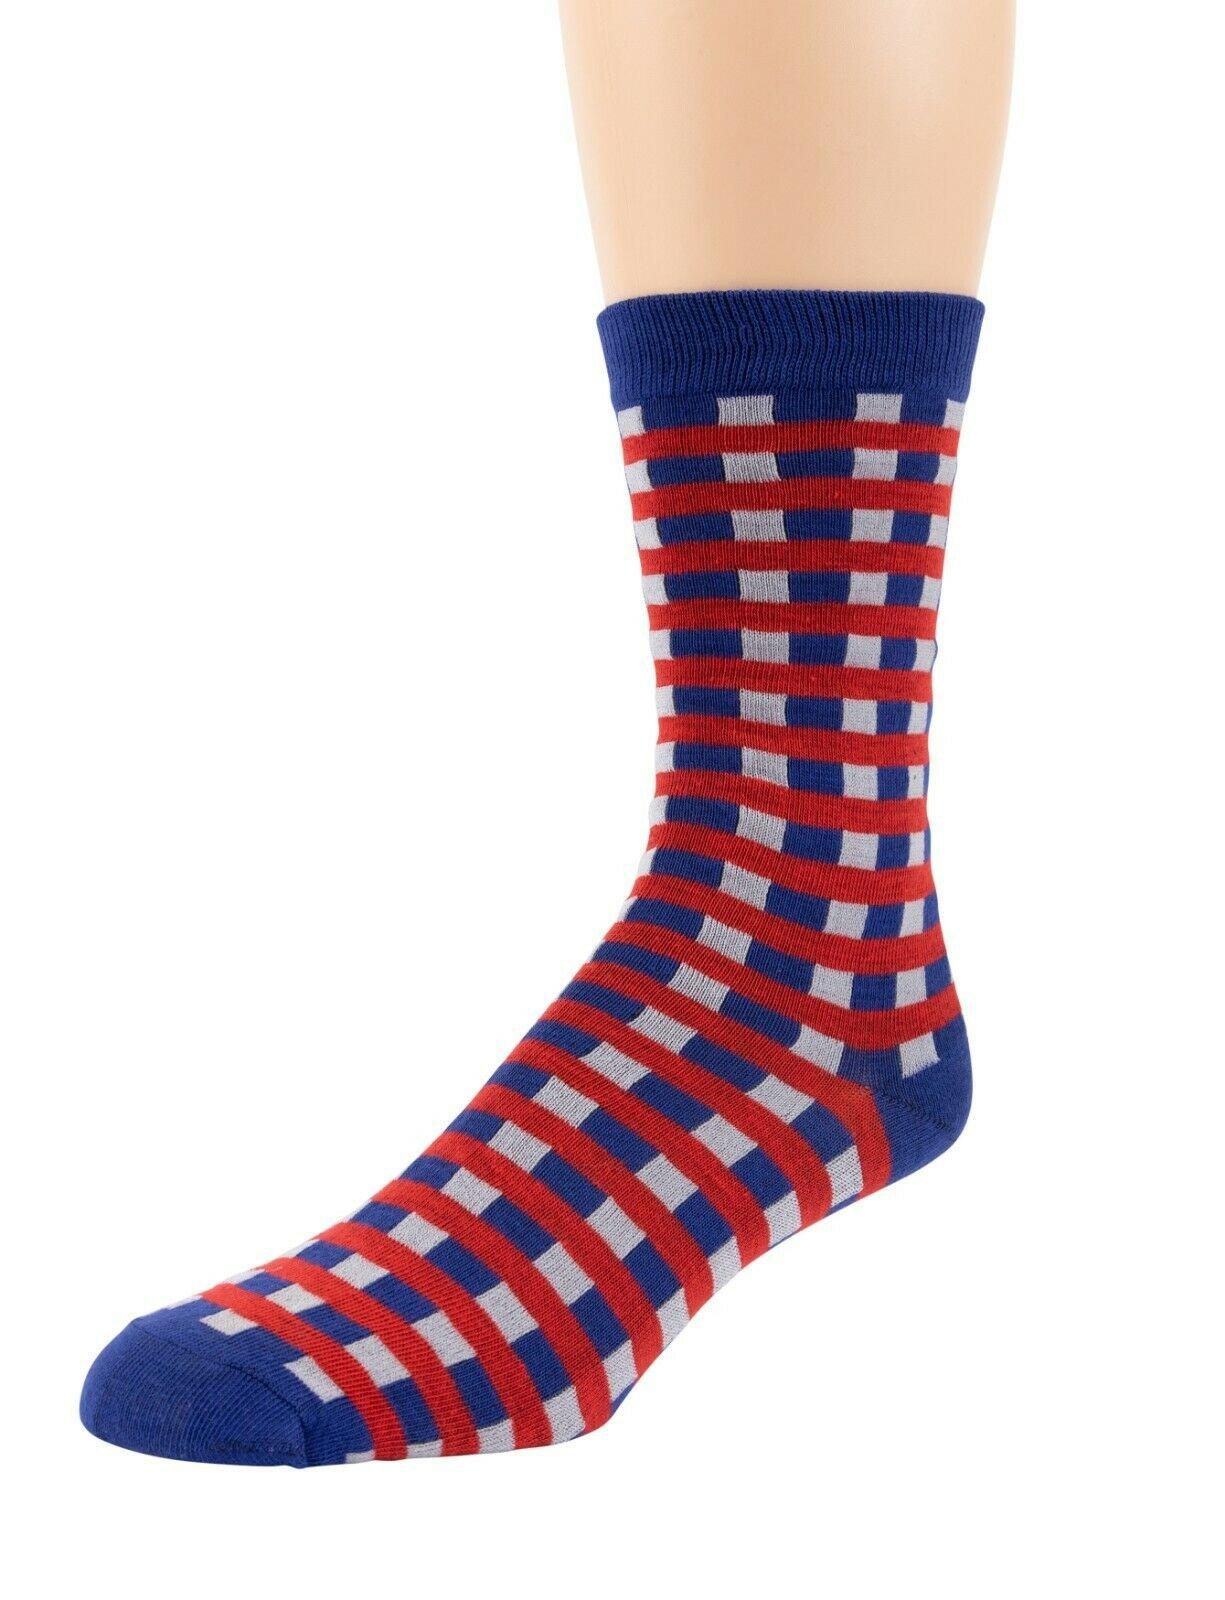 Mitch-Bogen-Mens-Cotton-Dress-Socks-Colorful-Fashion-Crew-Socks-8-Pack-Gift-Box thumbnail 33